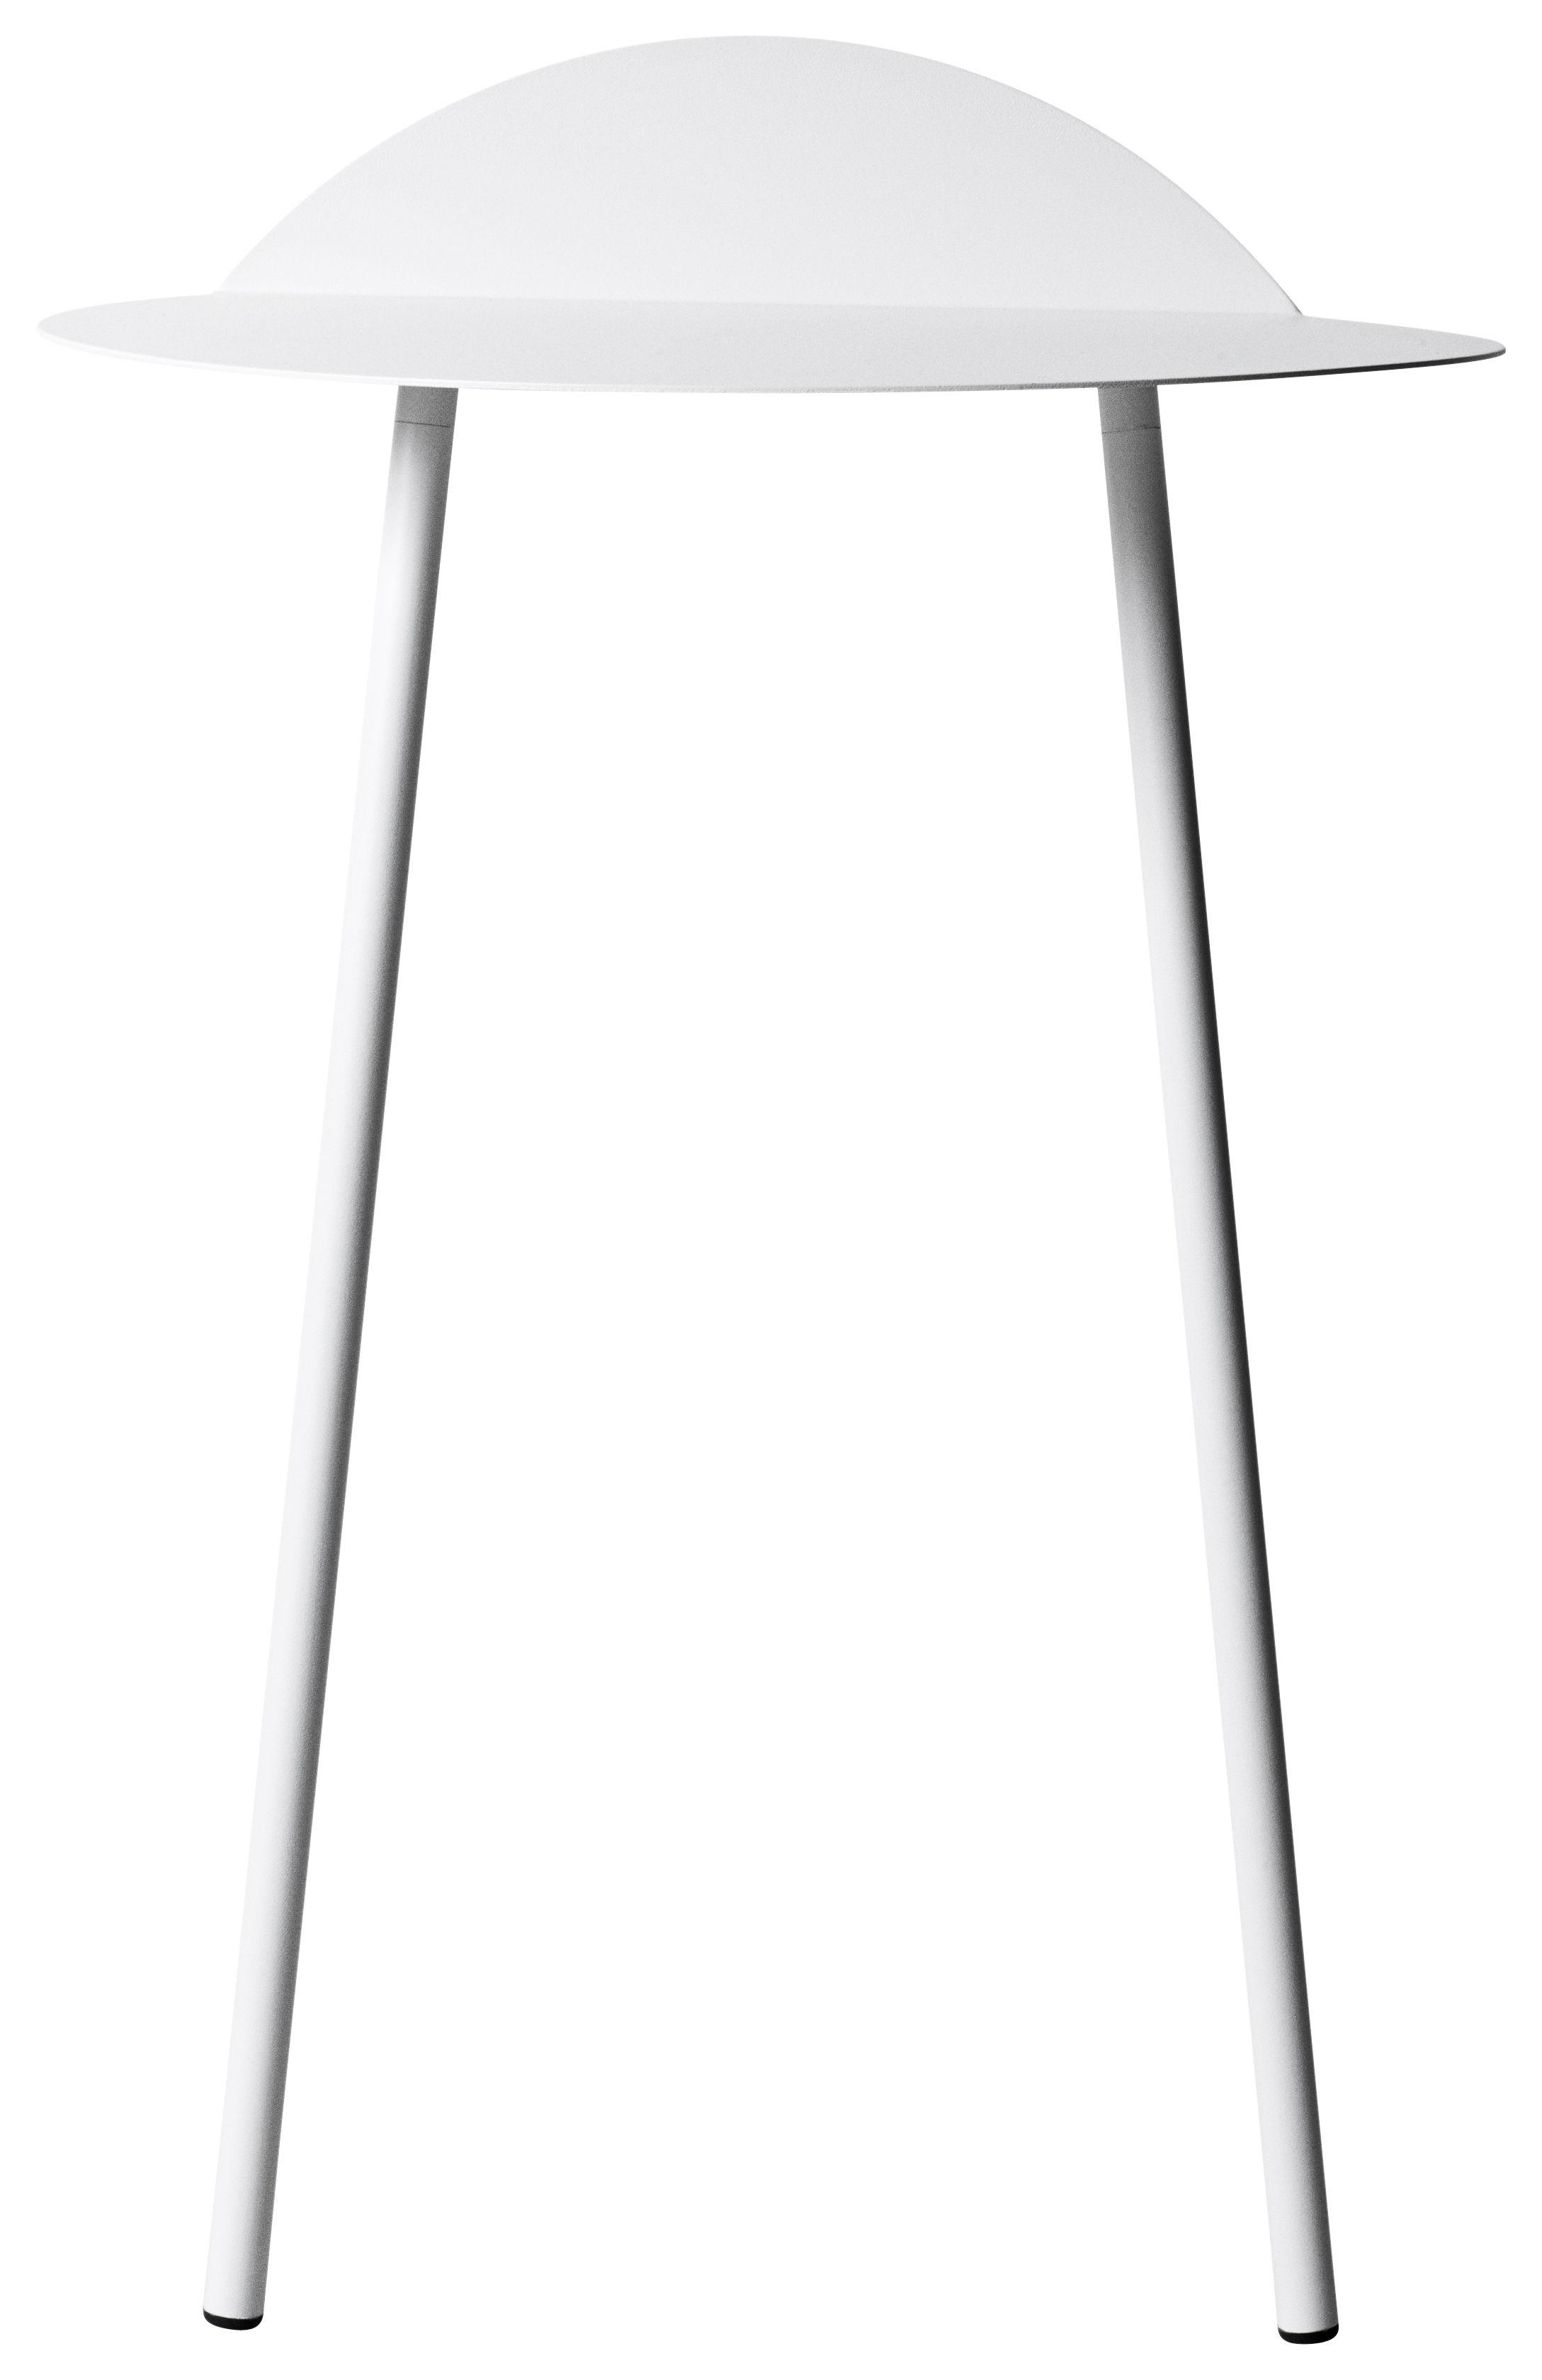 Mobilier - Consoles - Console Yeh Wall / H 71 cm - Menu - Blanc - Acier laqué